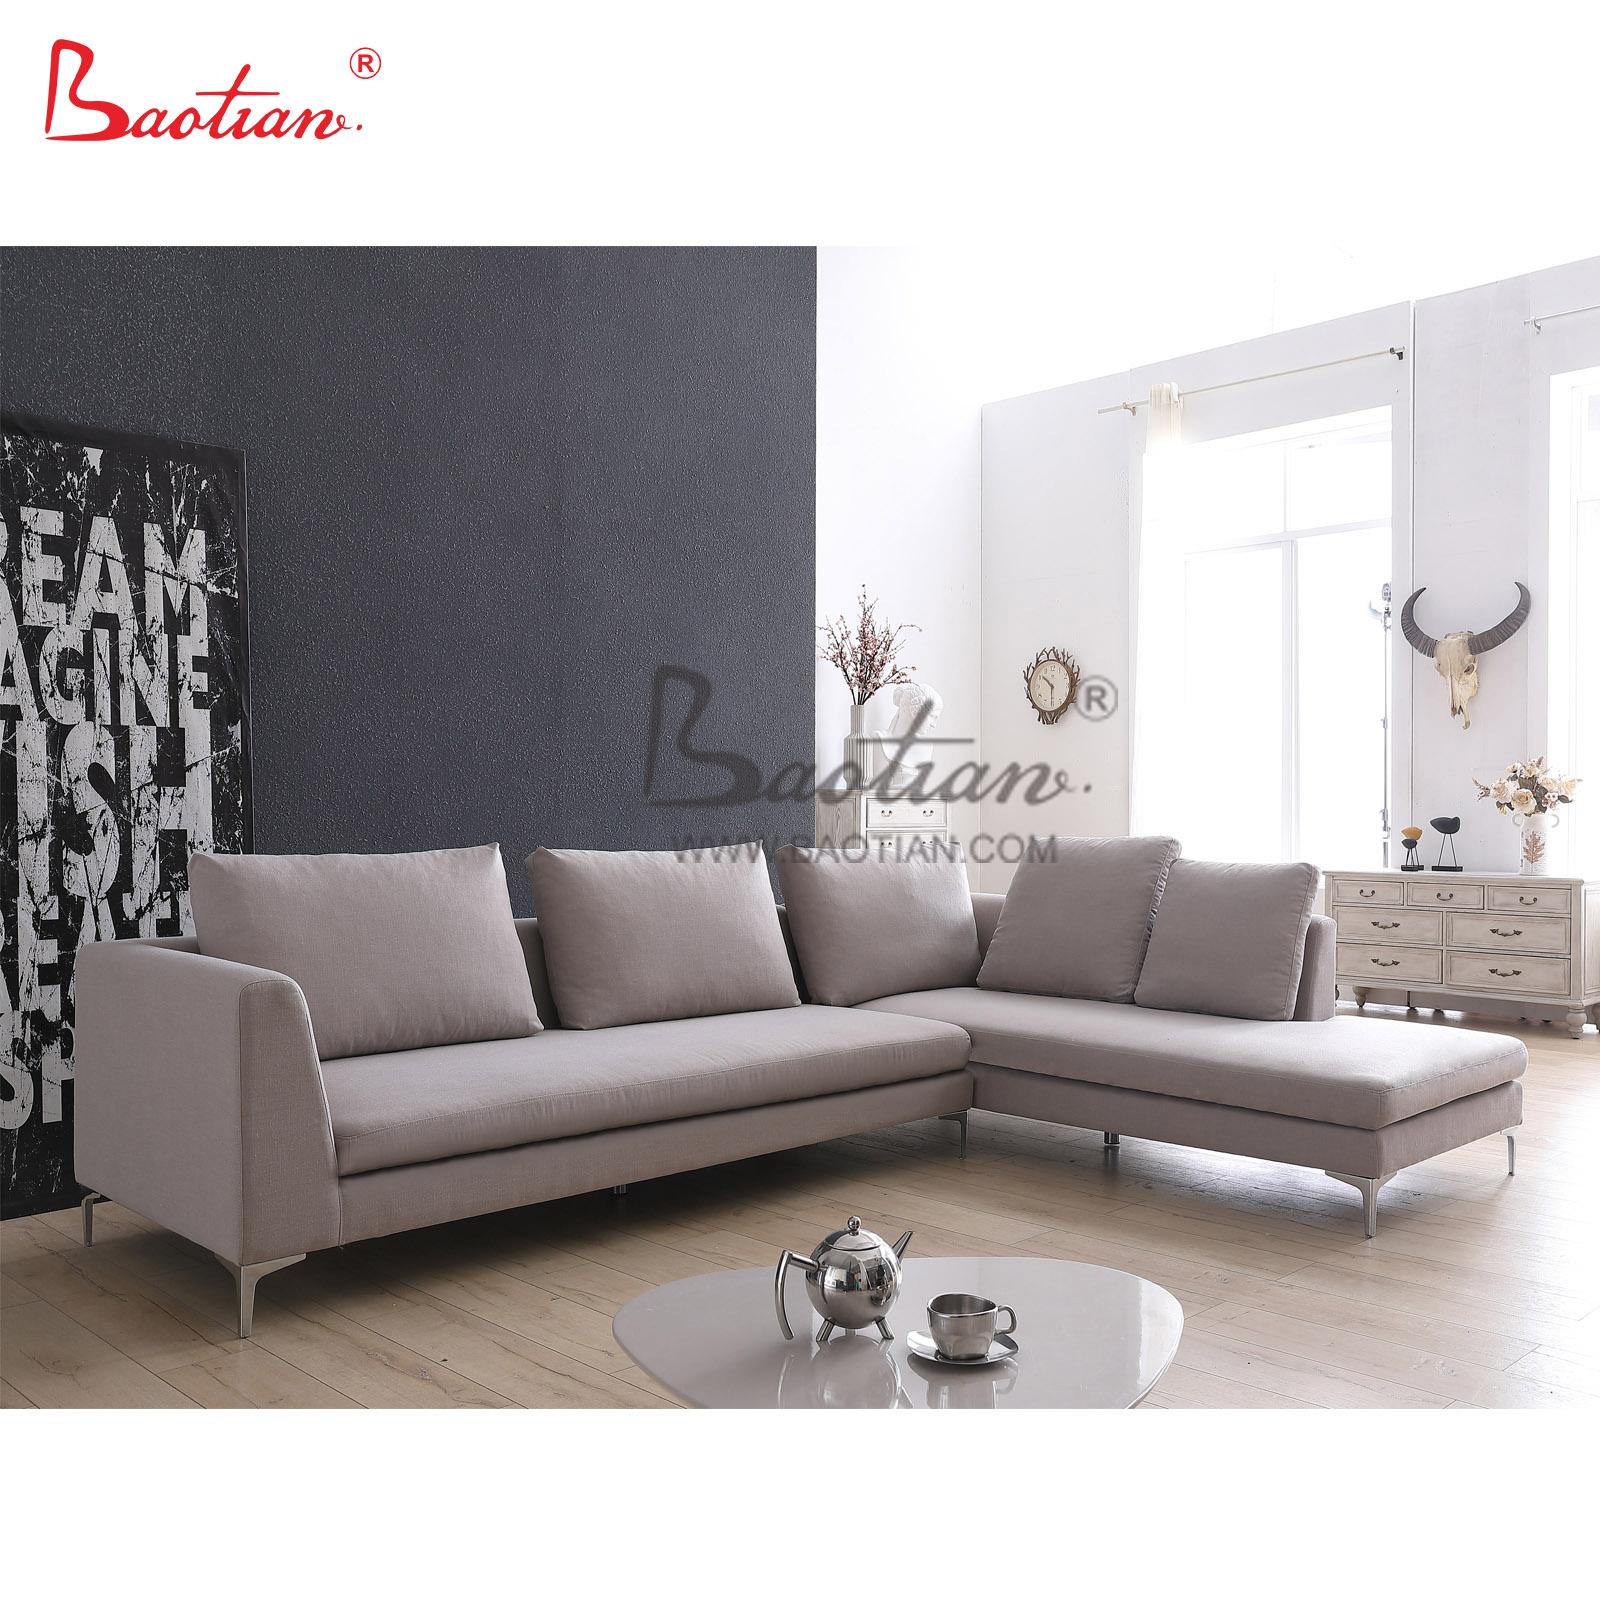 Baotian Furniture 2020 Modern Living Room Furniture Velvet Fabric Corner Sofa Buy Modern Sofas Sectional Sofa Living Sofa Product On Alibaba Com